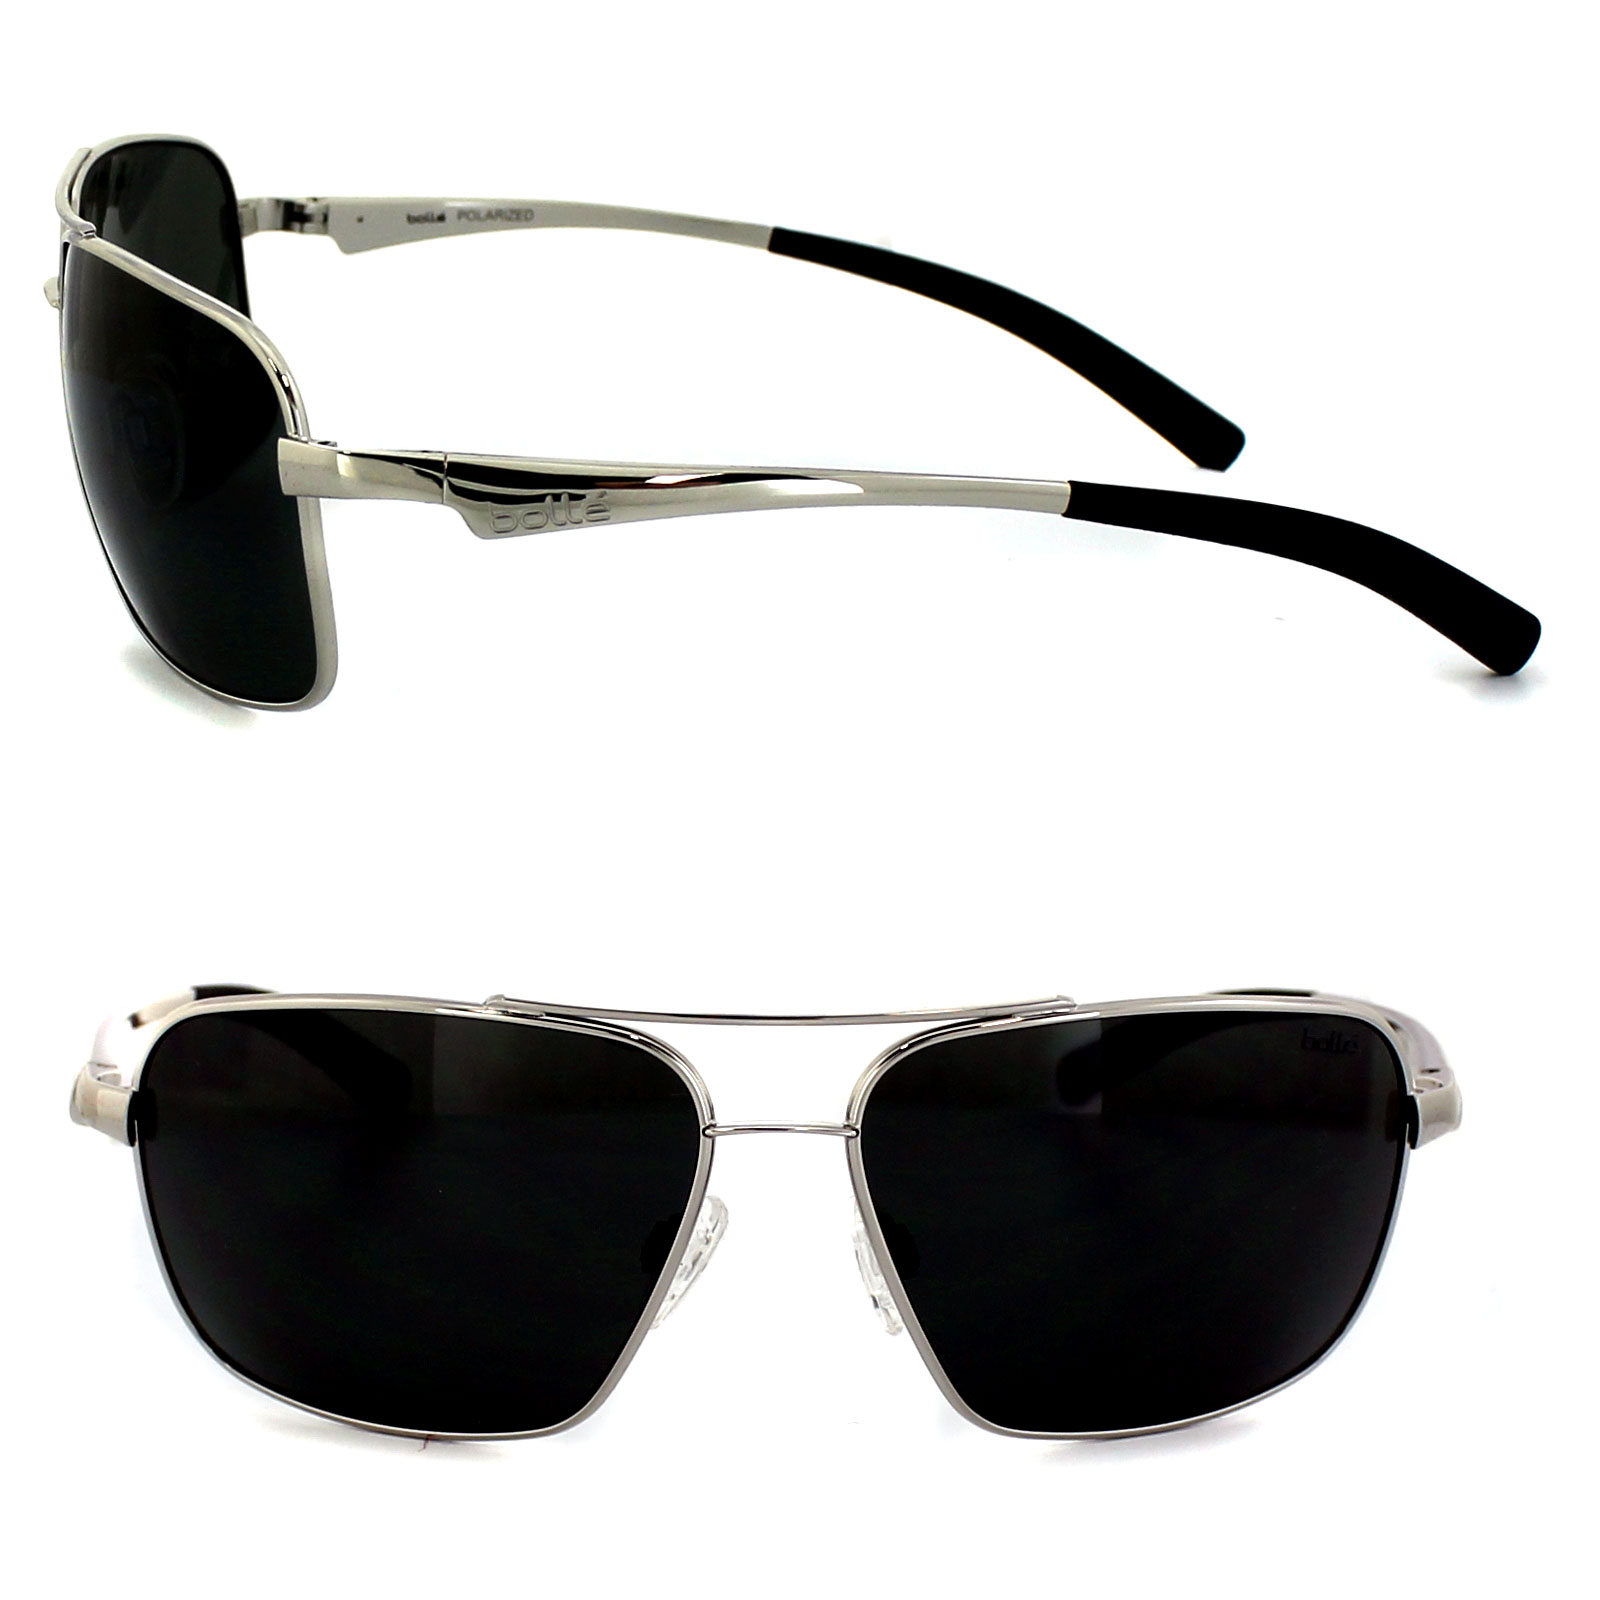 glasses cheap brothel brisbane